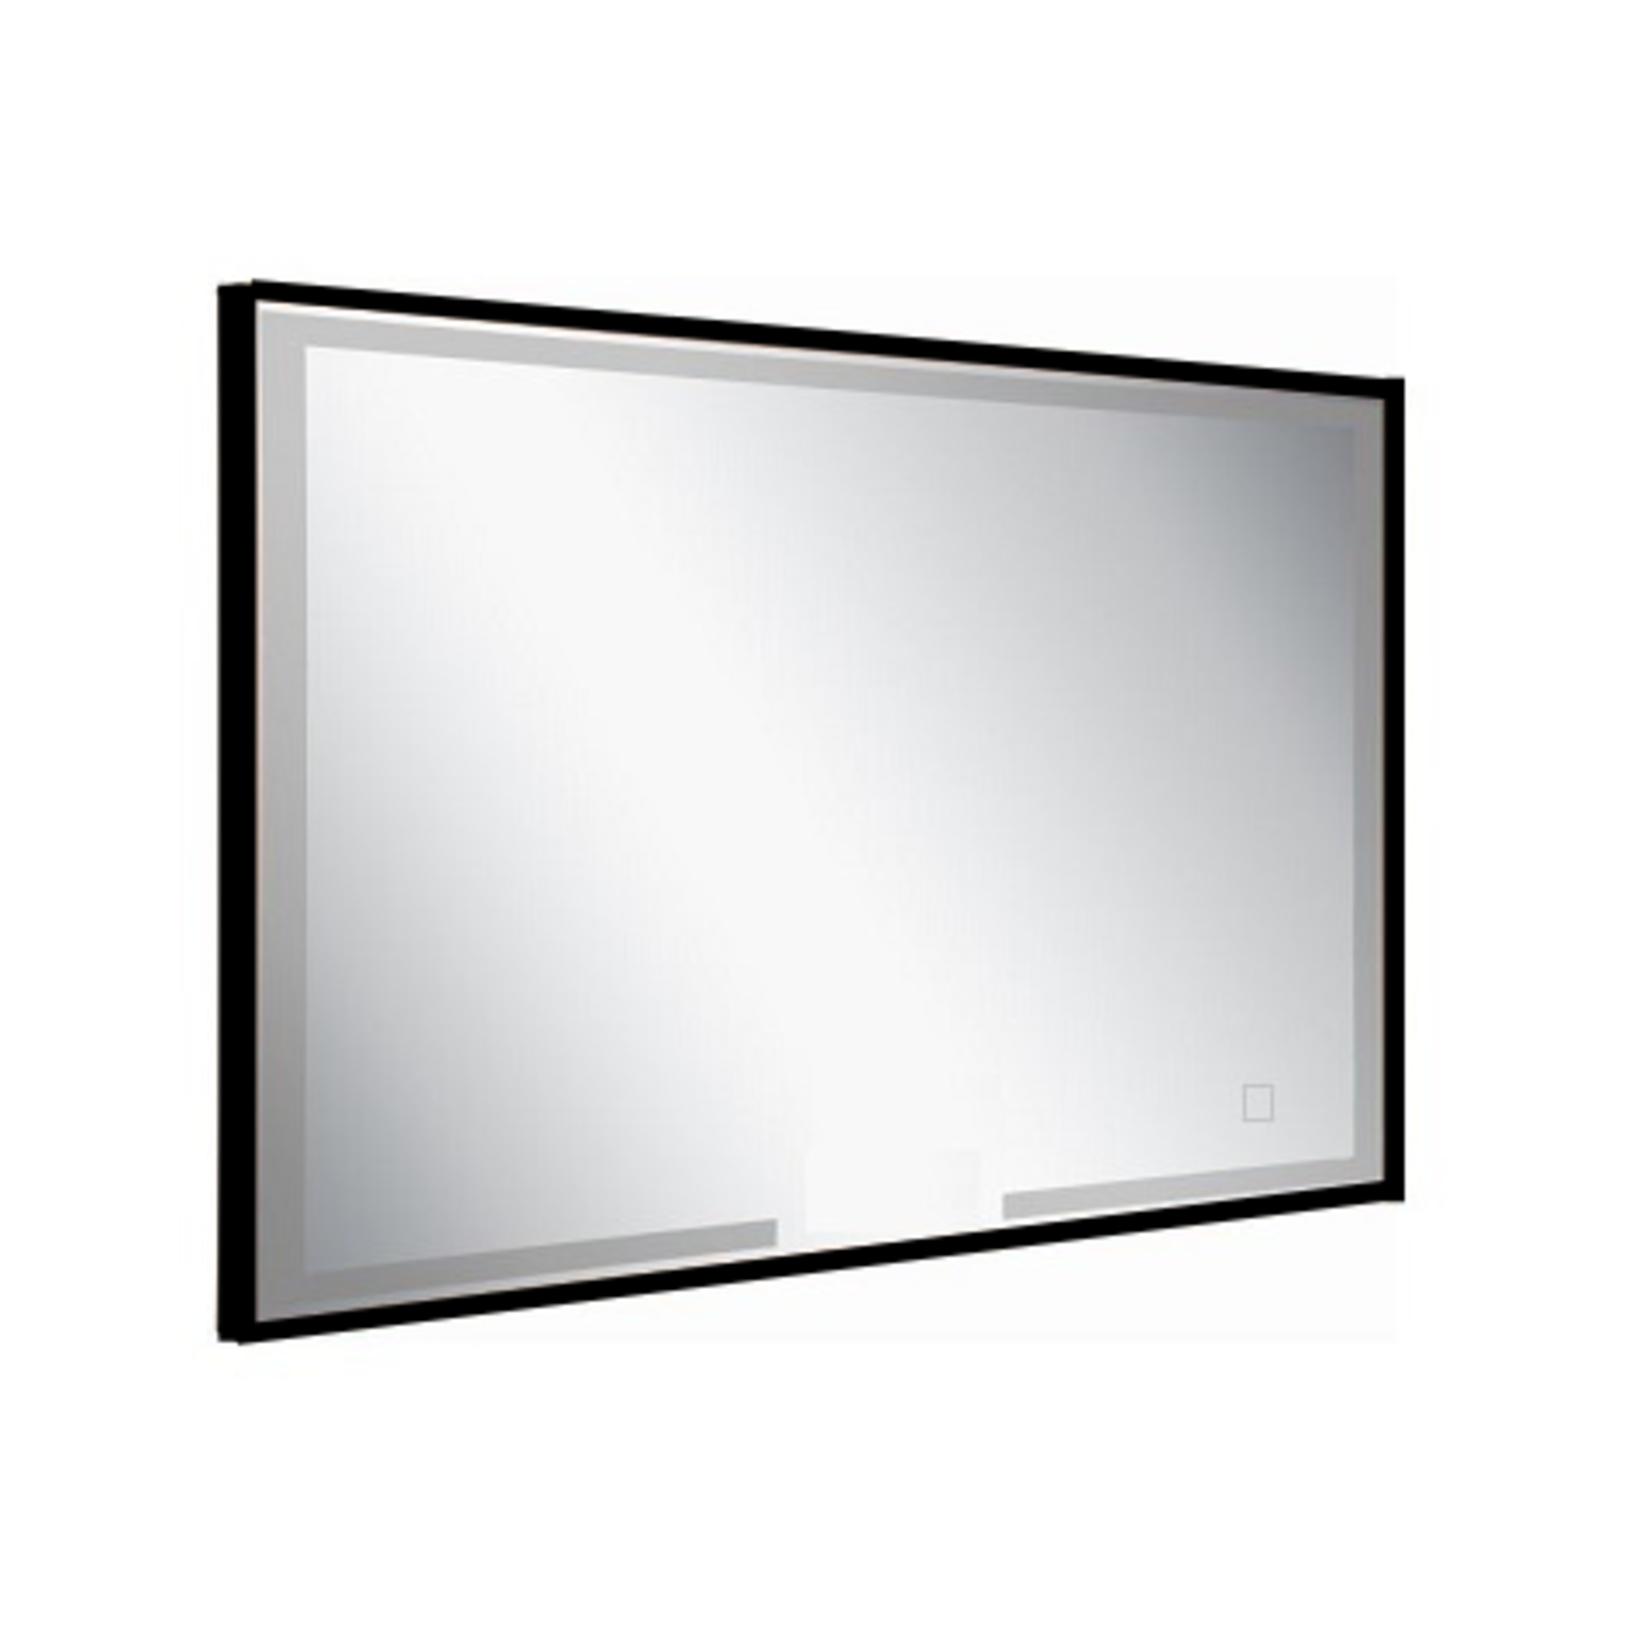 Rectangular LED Mirror with Black Contour AMC13B03-32